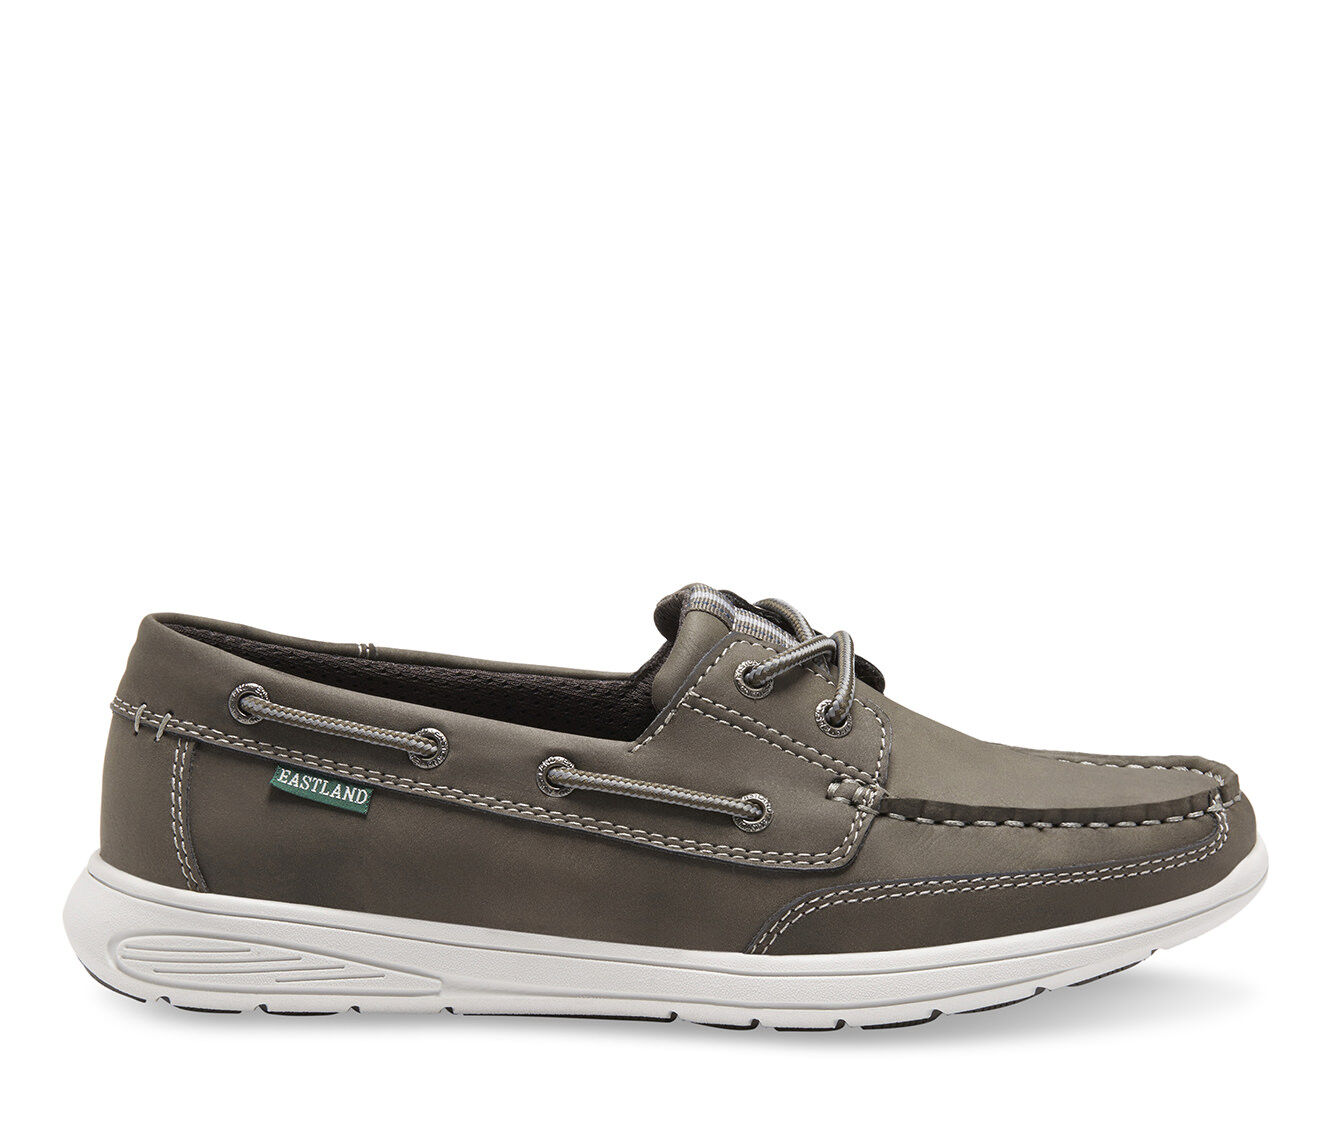 Men's Eastland Benton Boat Shoes Gray